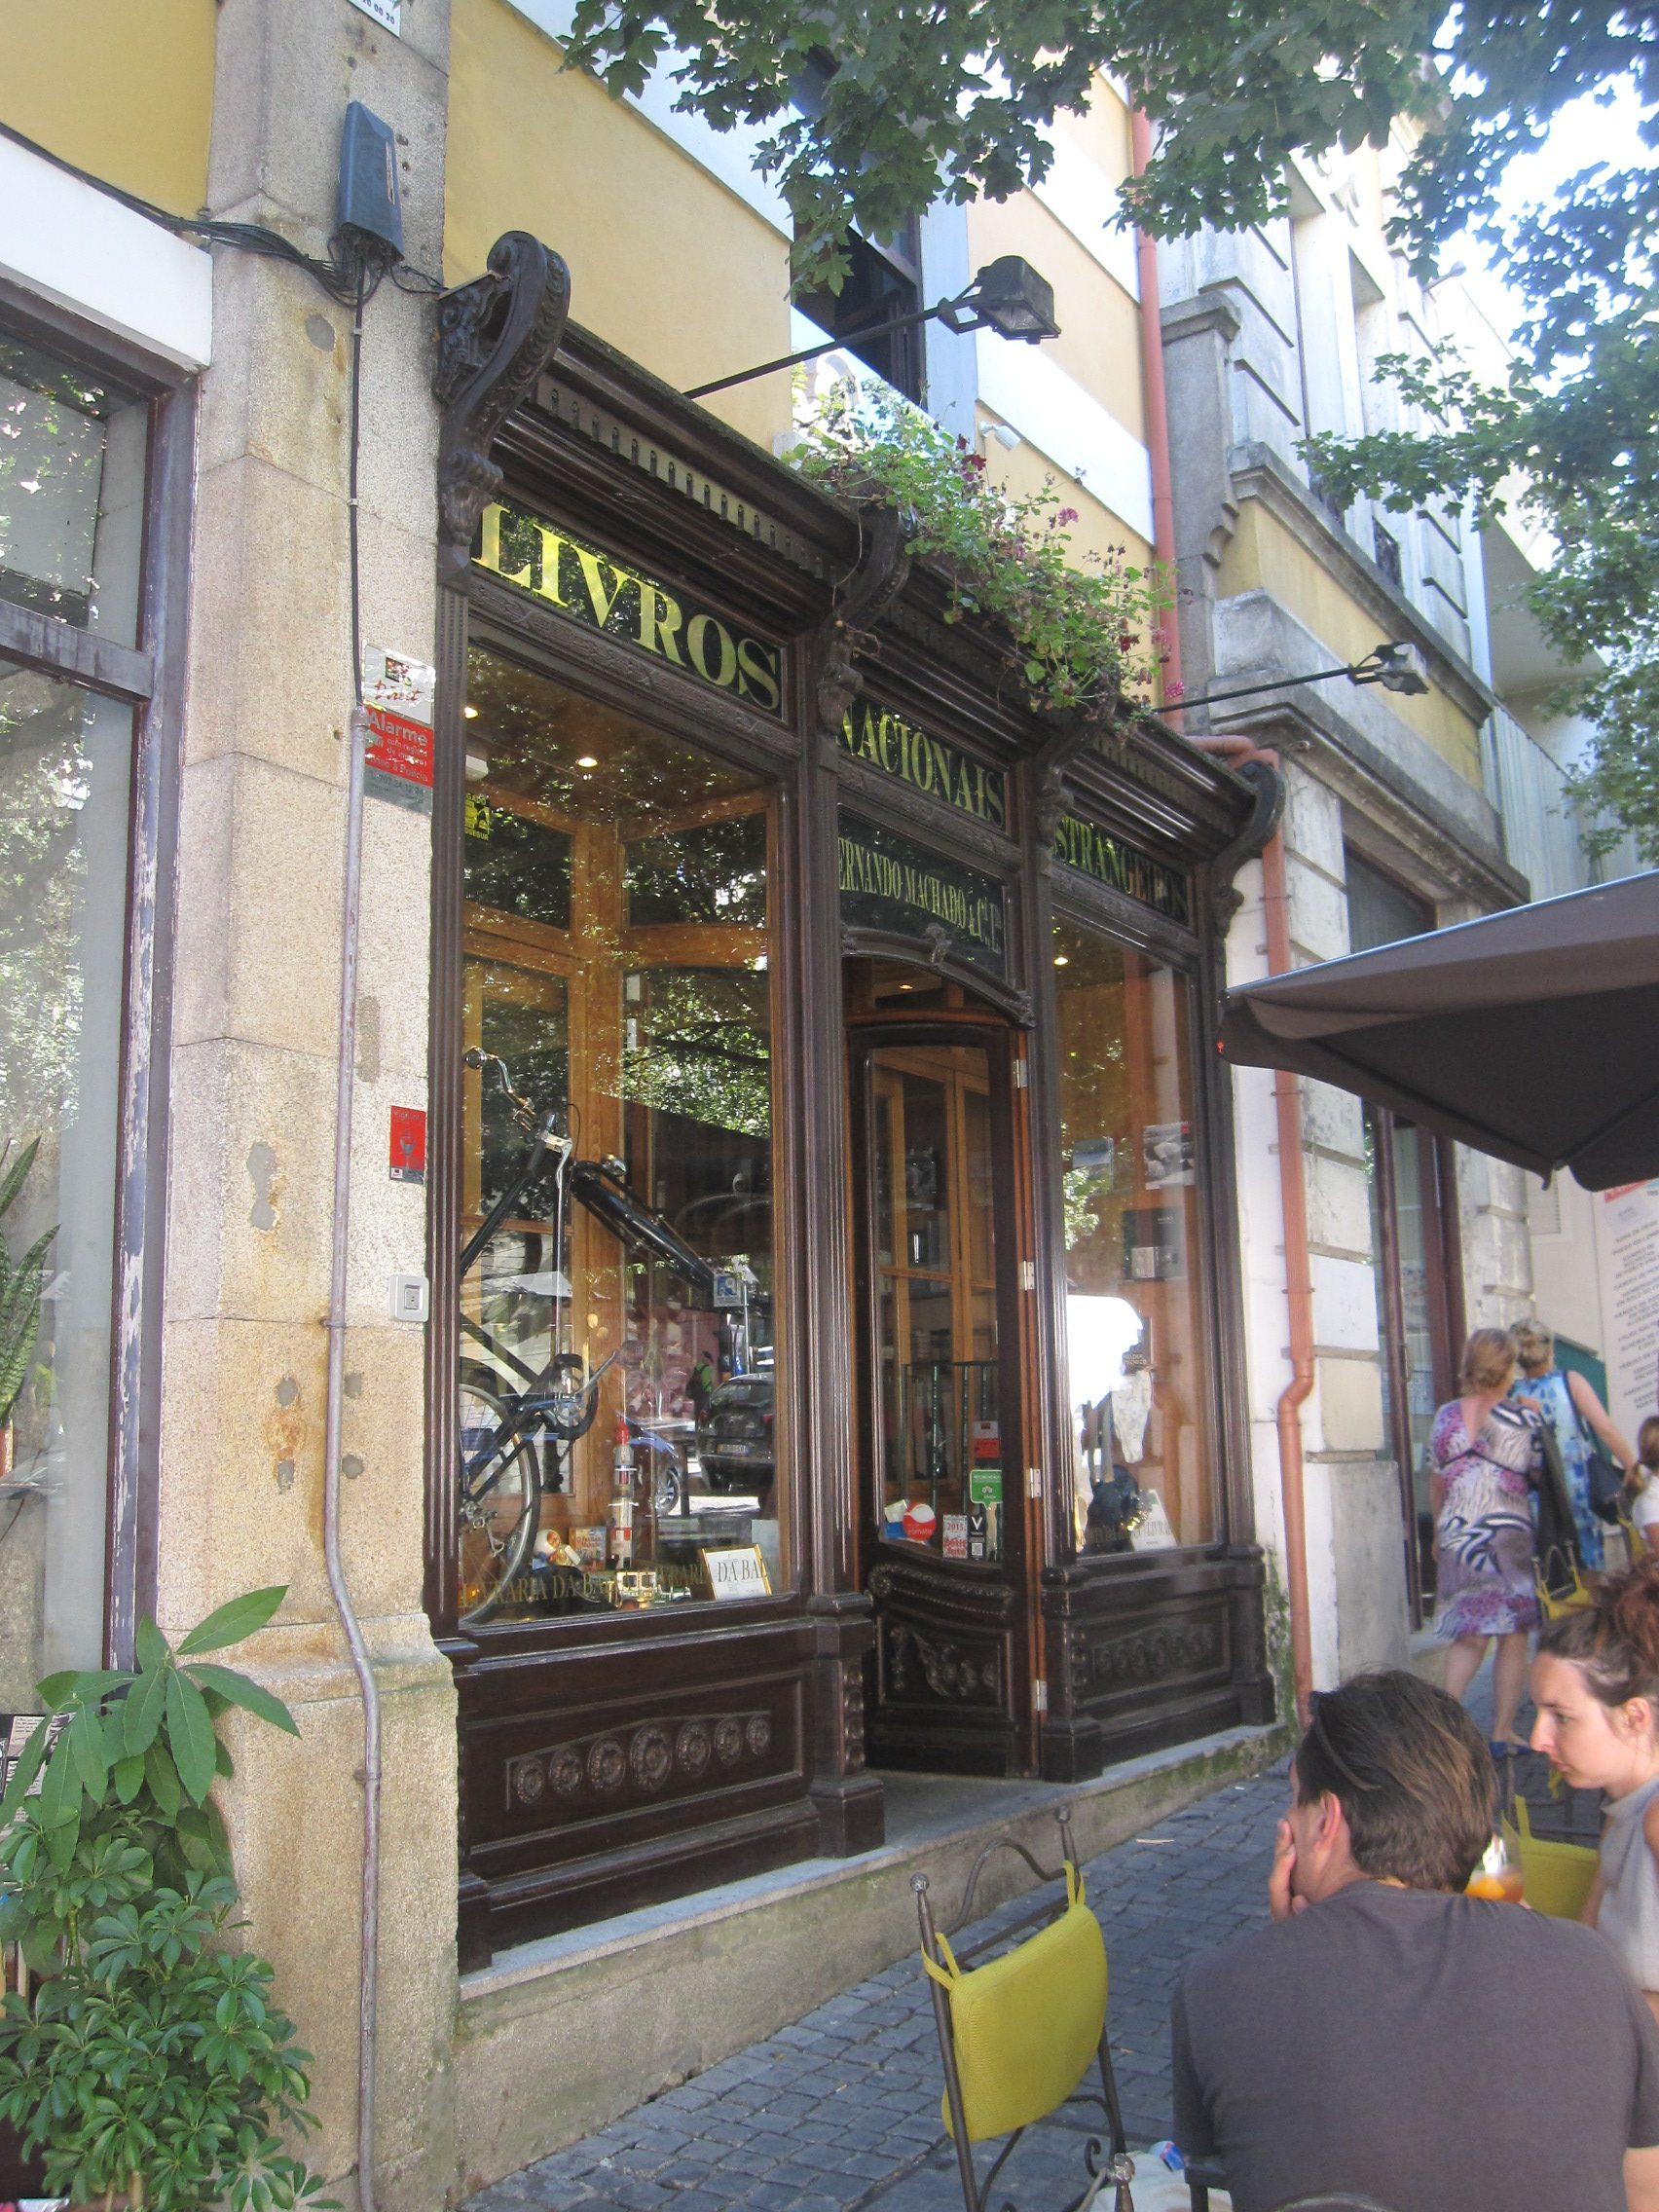 Librairie-transformee-en-cafe